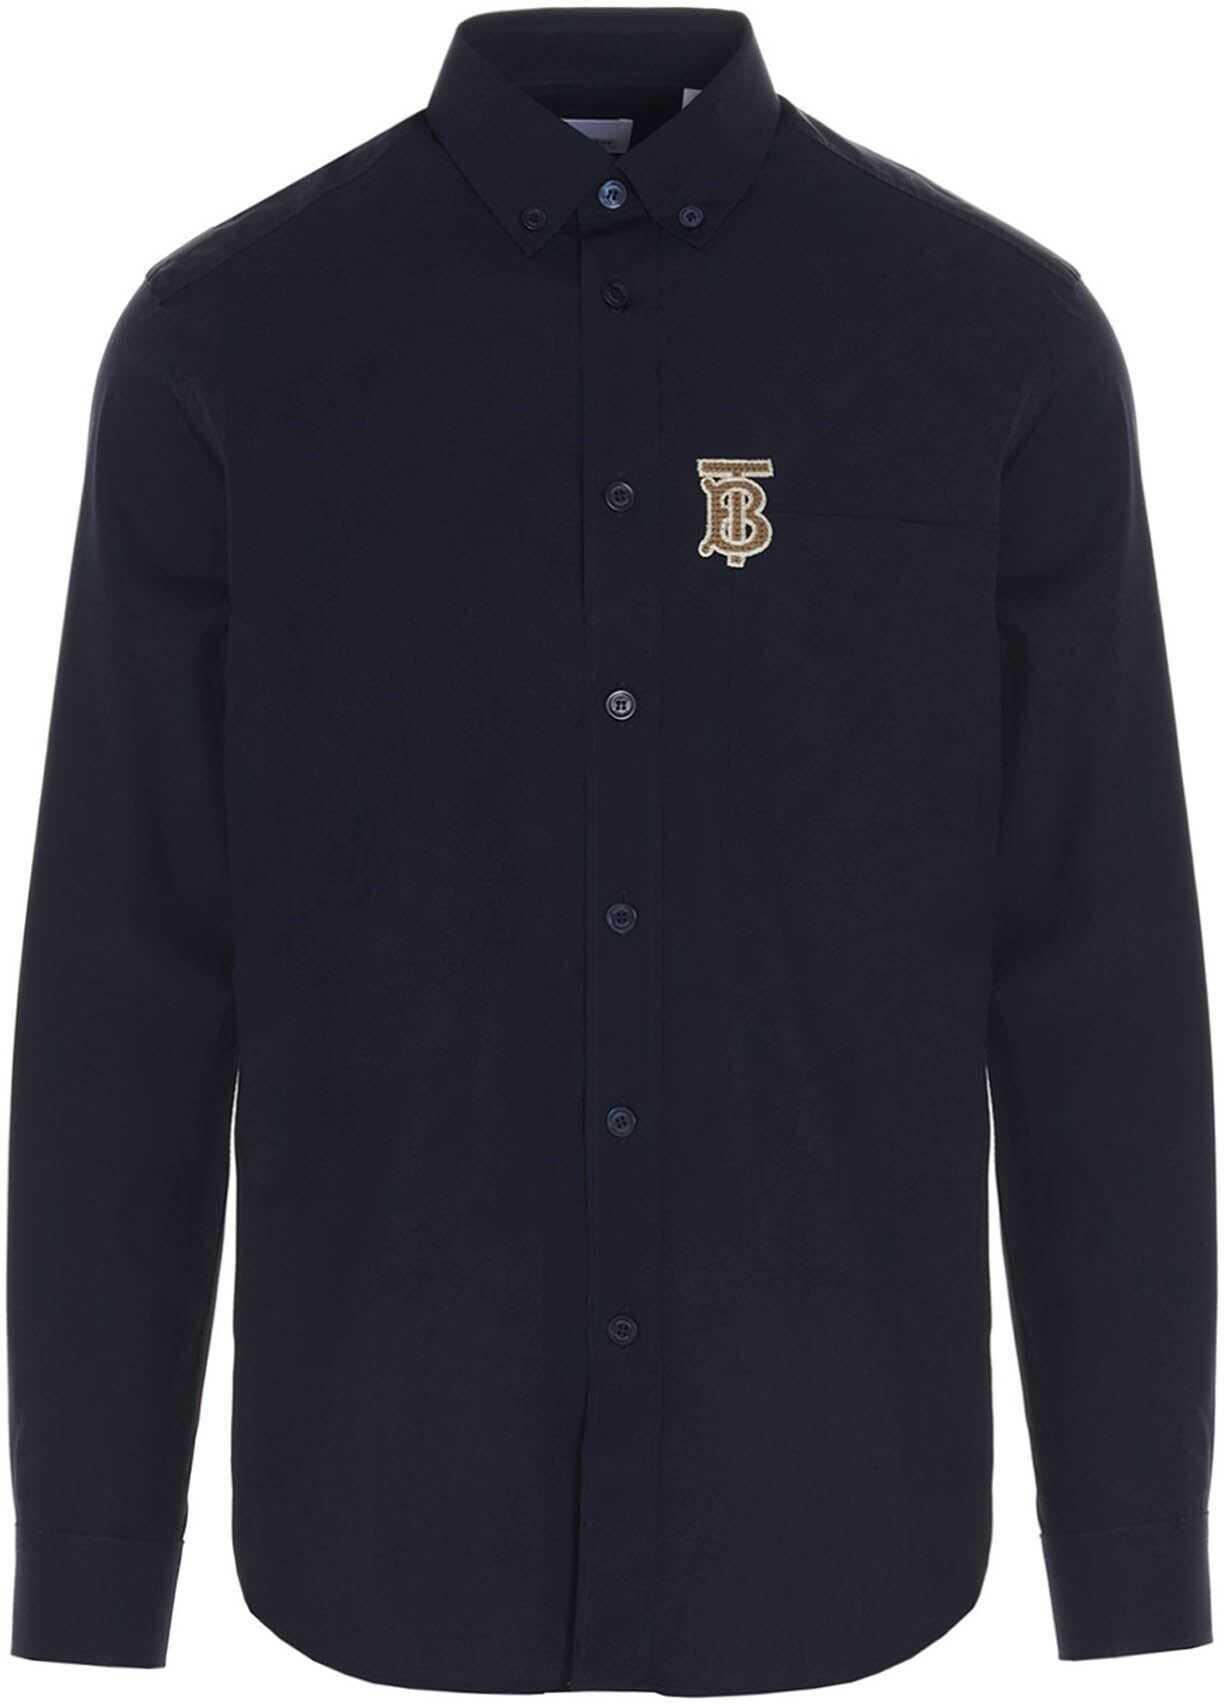 Burberry Contrasting Monogram Shirt In Navy Blue Blue imagine